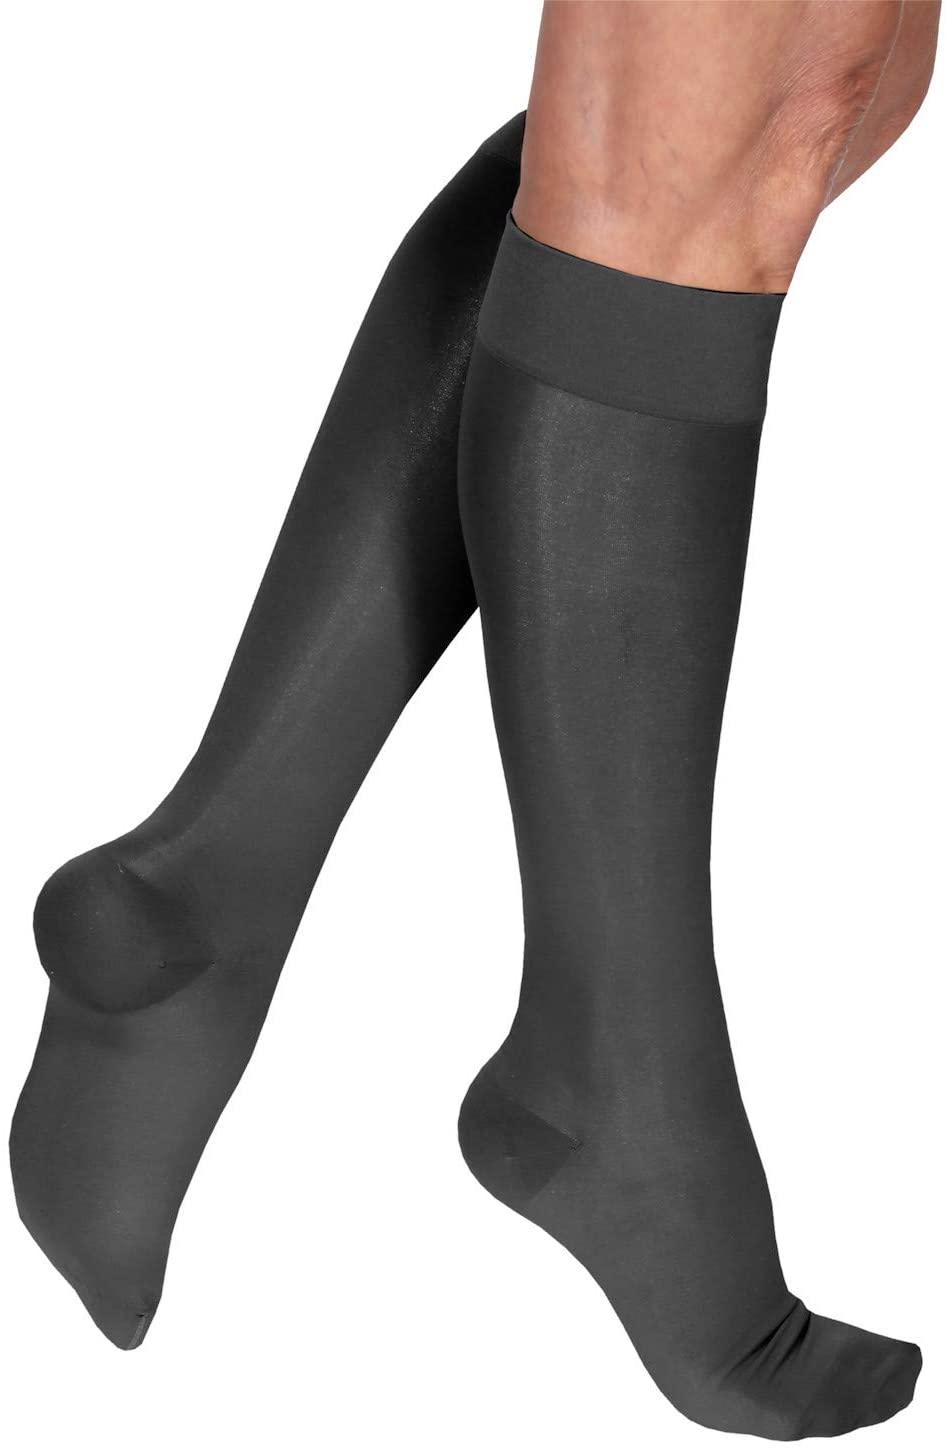 Support Plus Women's Mild Compression Knee Highs - Wide Calf Black Premier Sheer Stockings - X Large